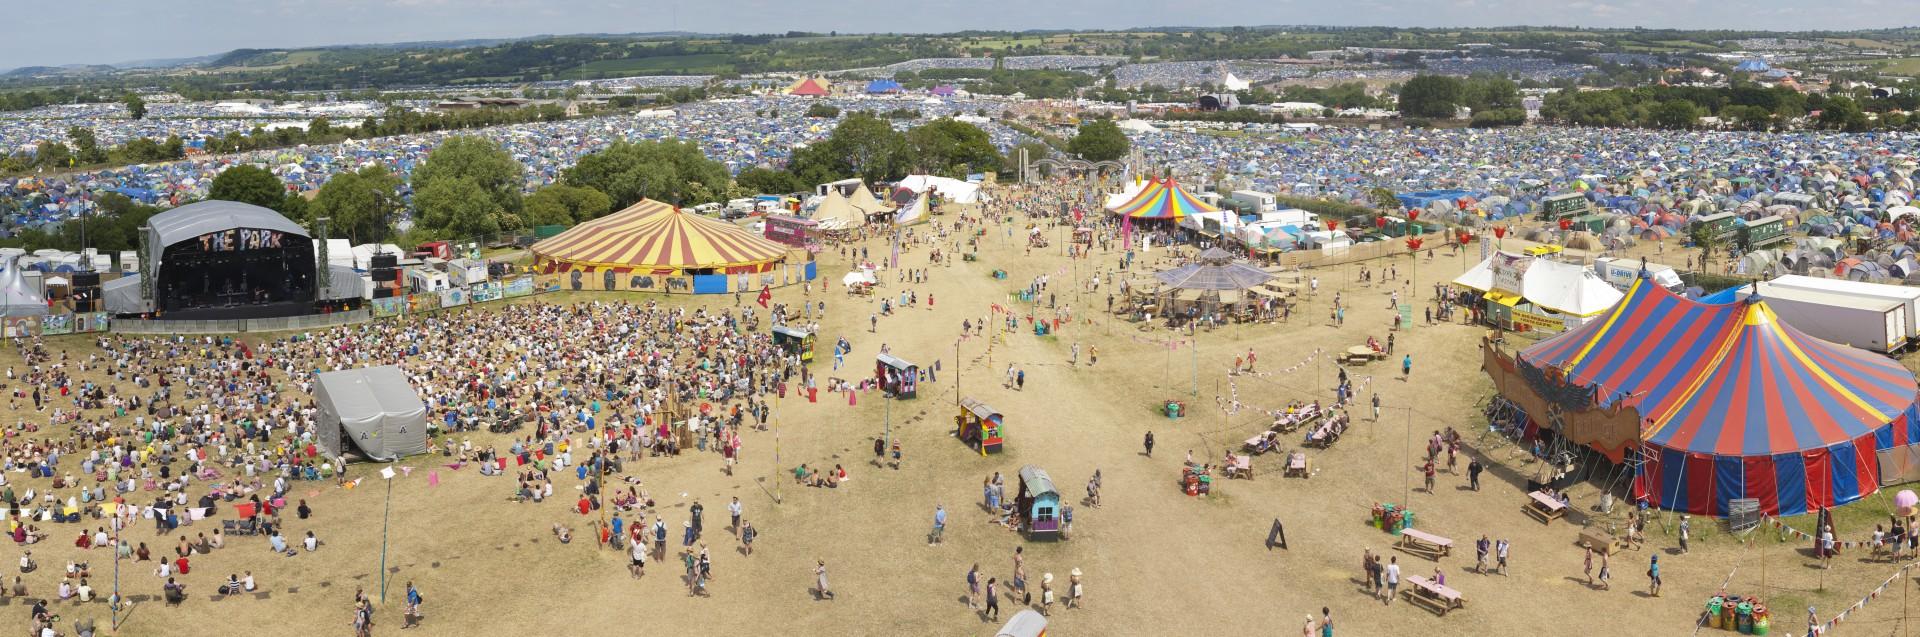 Festivals - 1